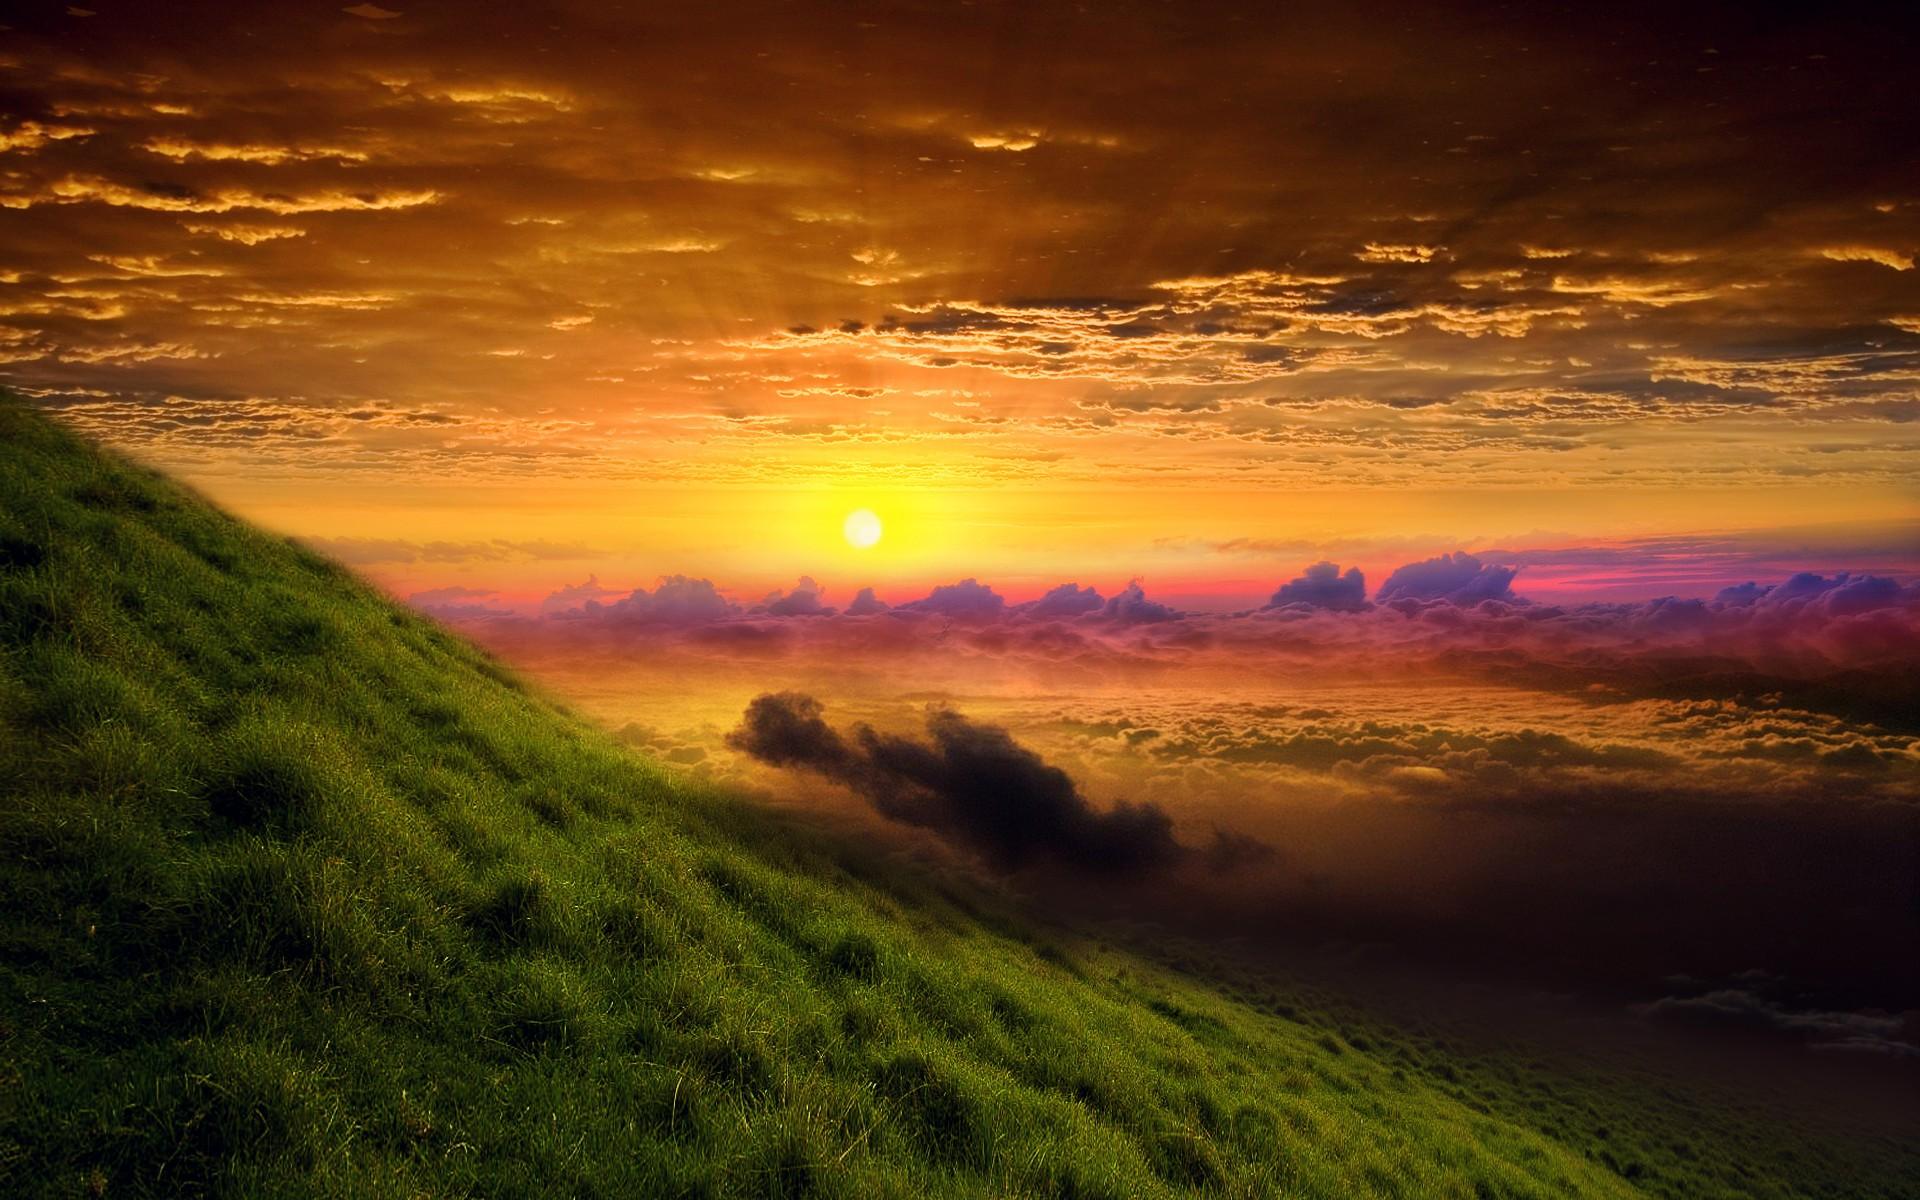 Stunning Nature Hd Wallpaper: Sunrise Glory, HD Nature, 4k Wallpapers, Images